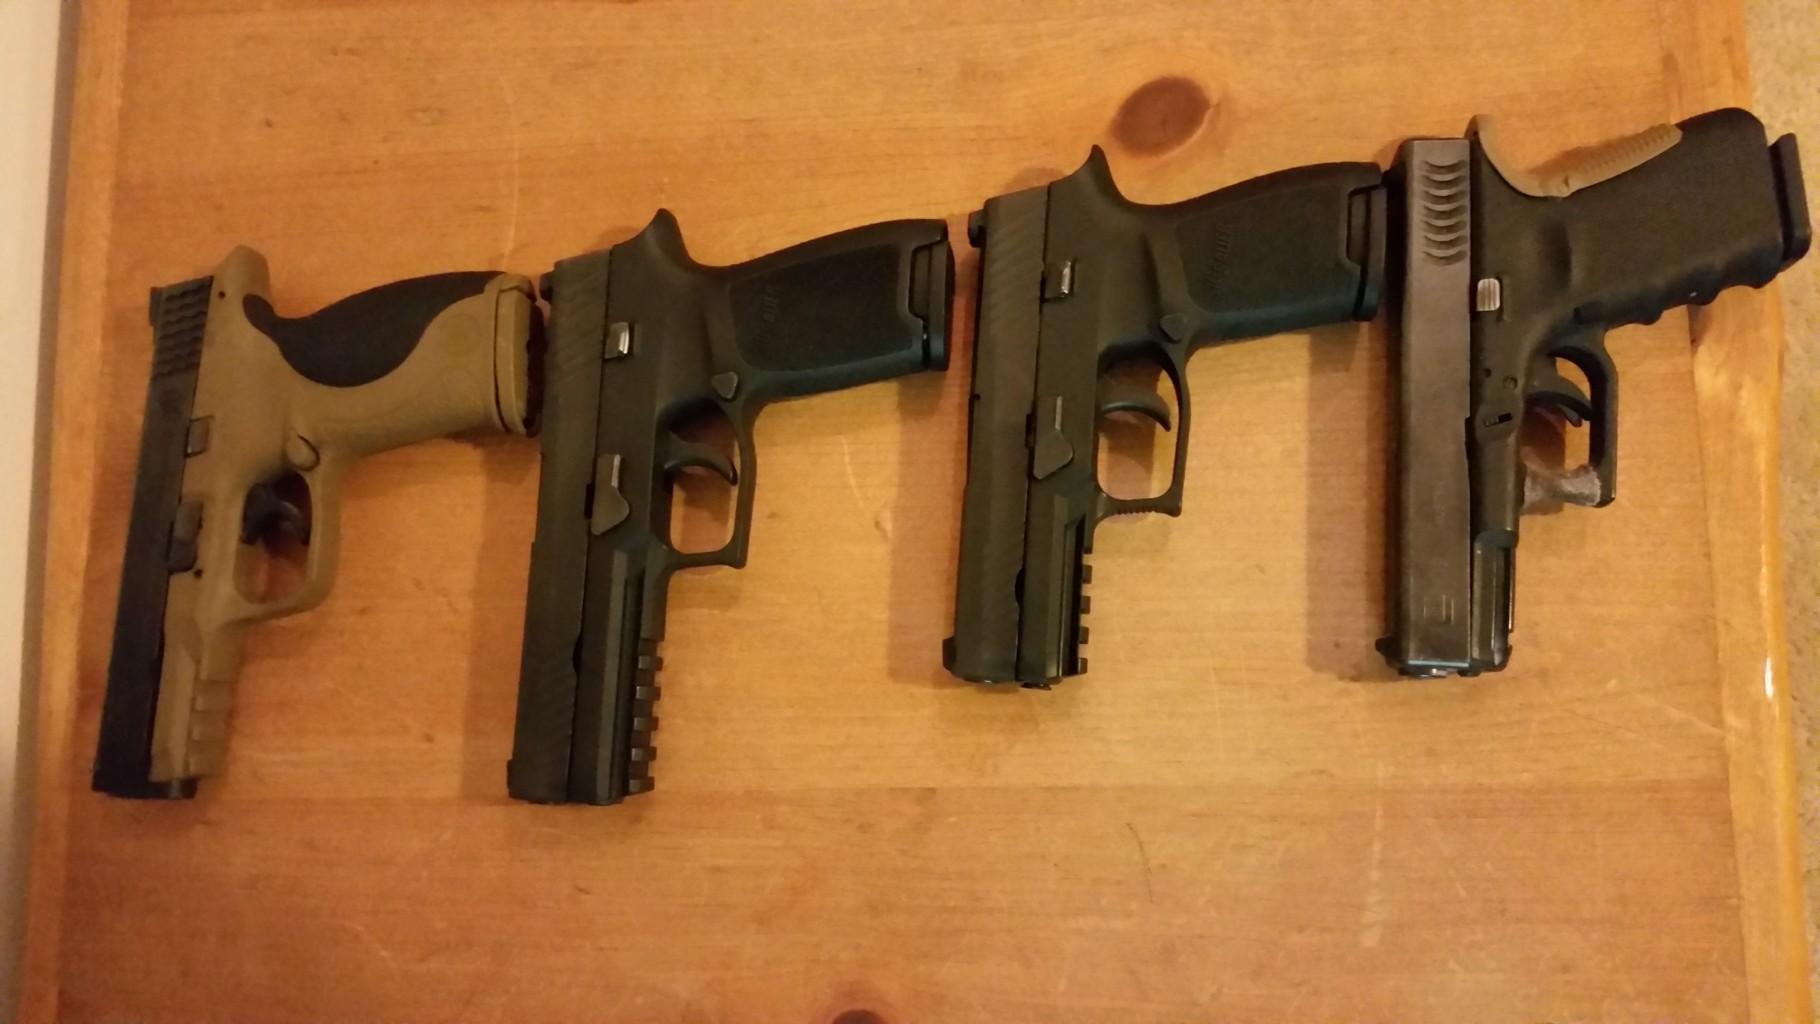 Personal Defense Tactics and Gun Rights News | One Defense